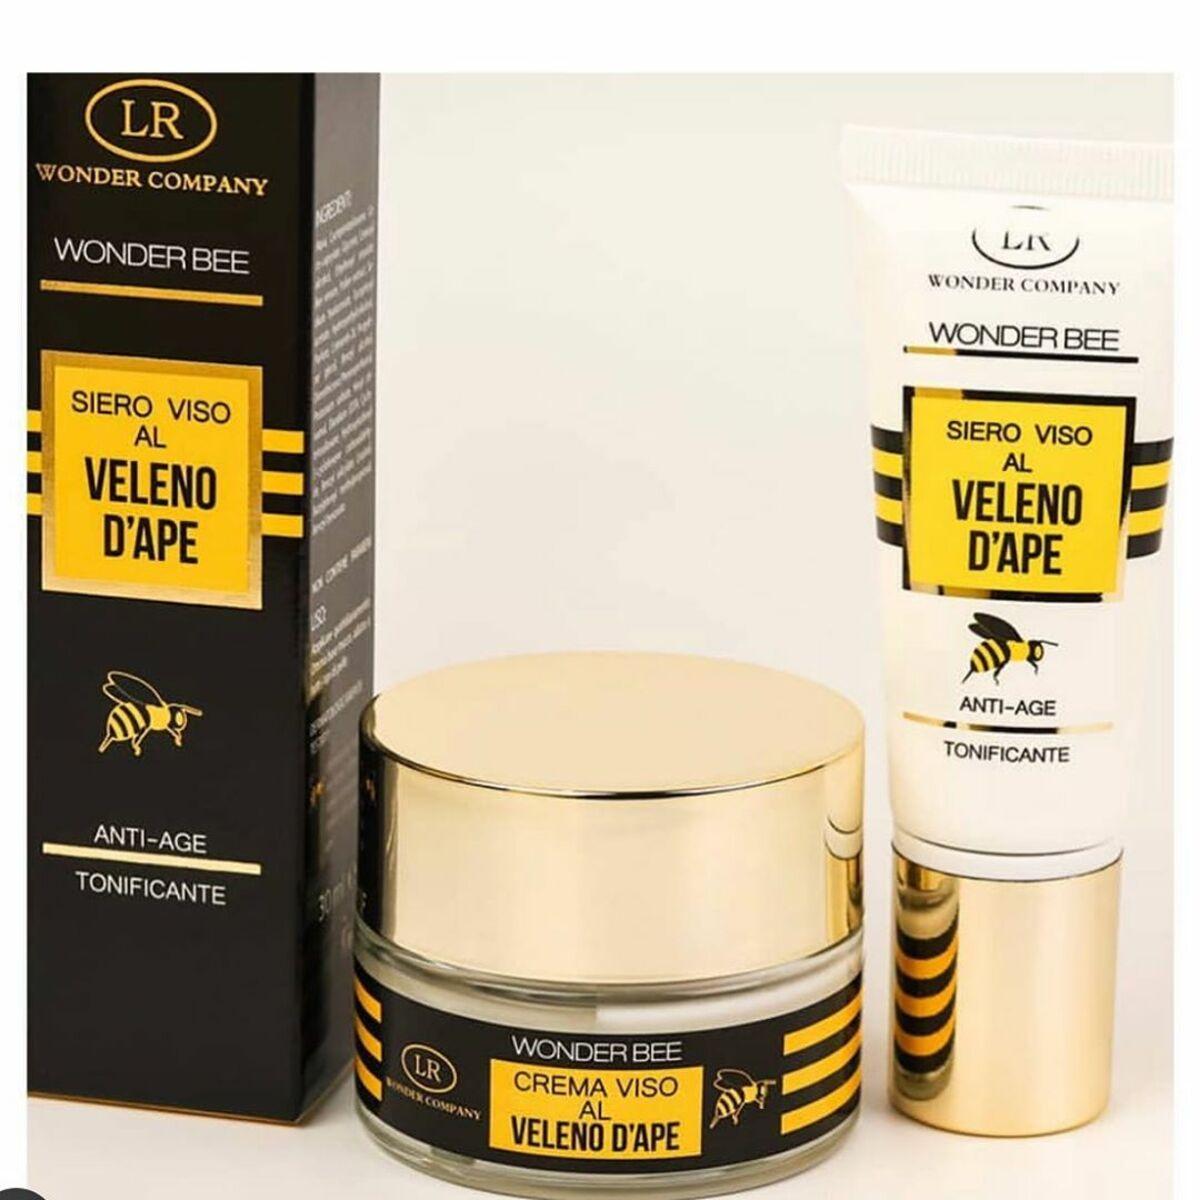 LR wonder company: i prodotti al veleno d'ape